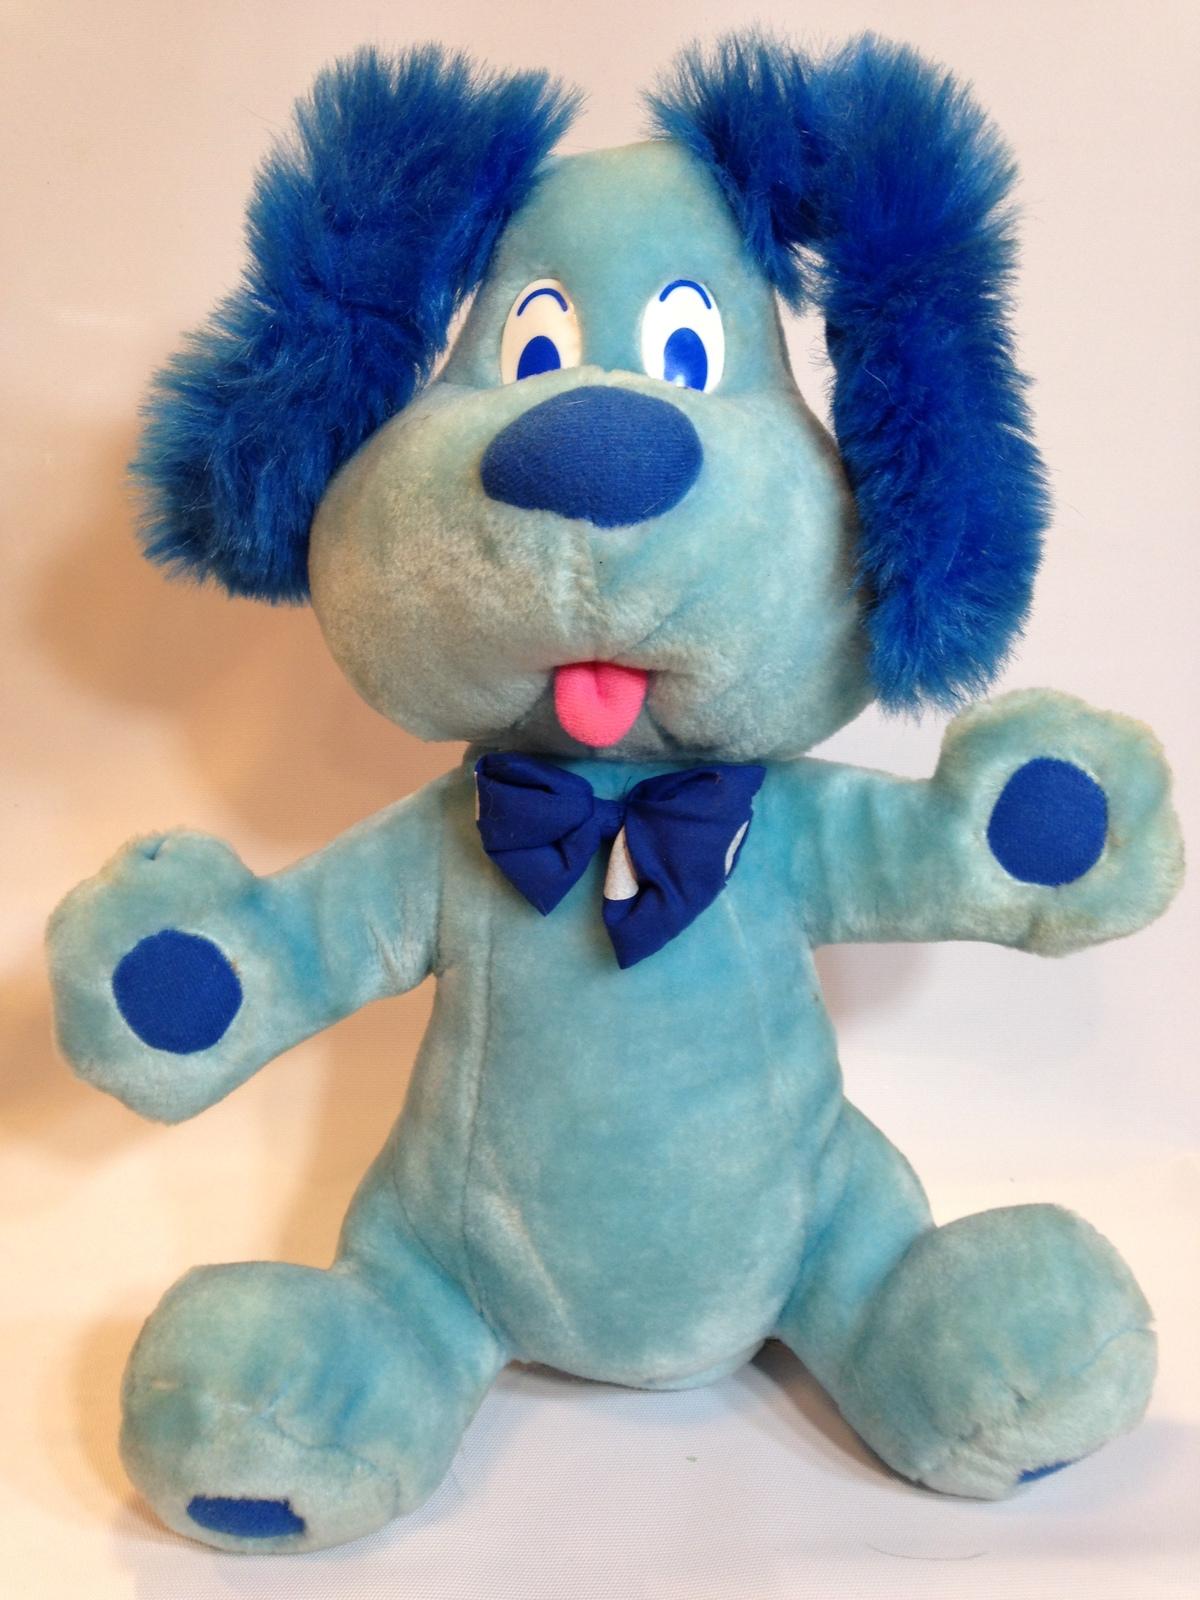 goffa vintage plush blue dog puppy pooch 16 inch stuffed animal hound bow tie vintage. Black Bedroom Furniture Sets. Home Design Ideas